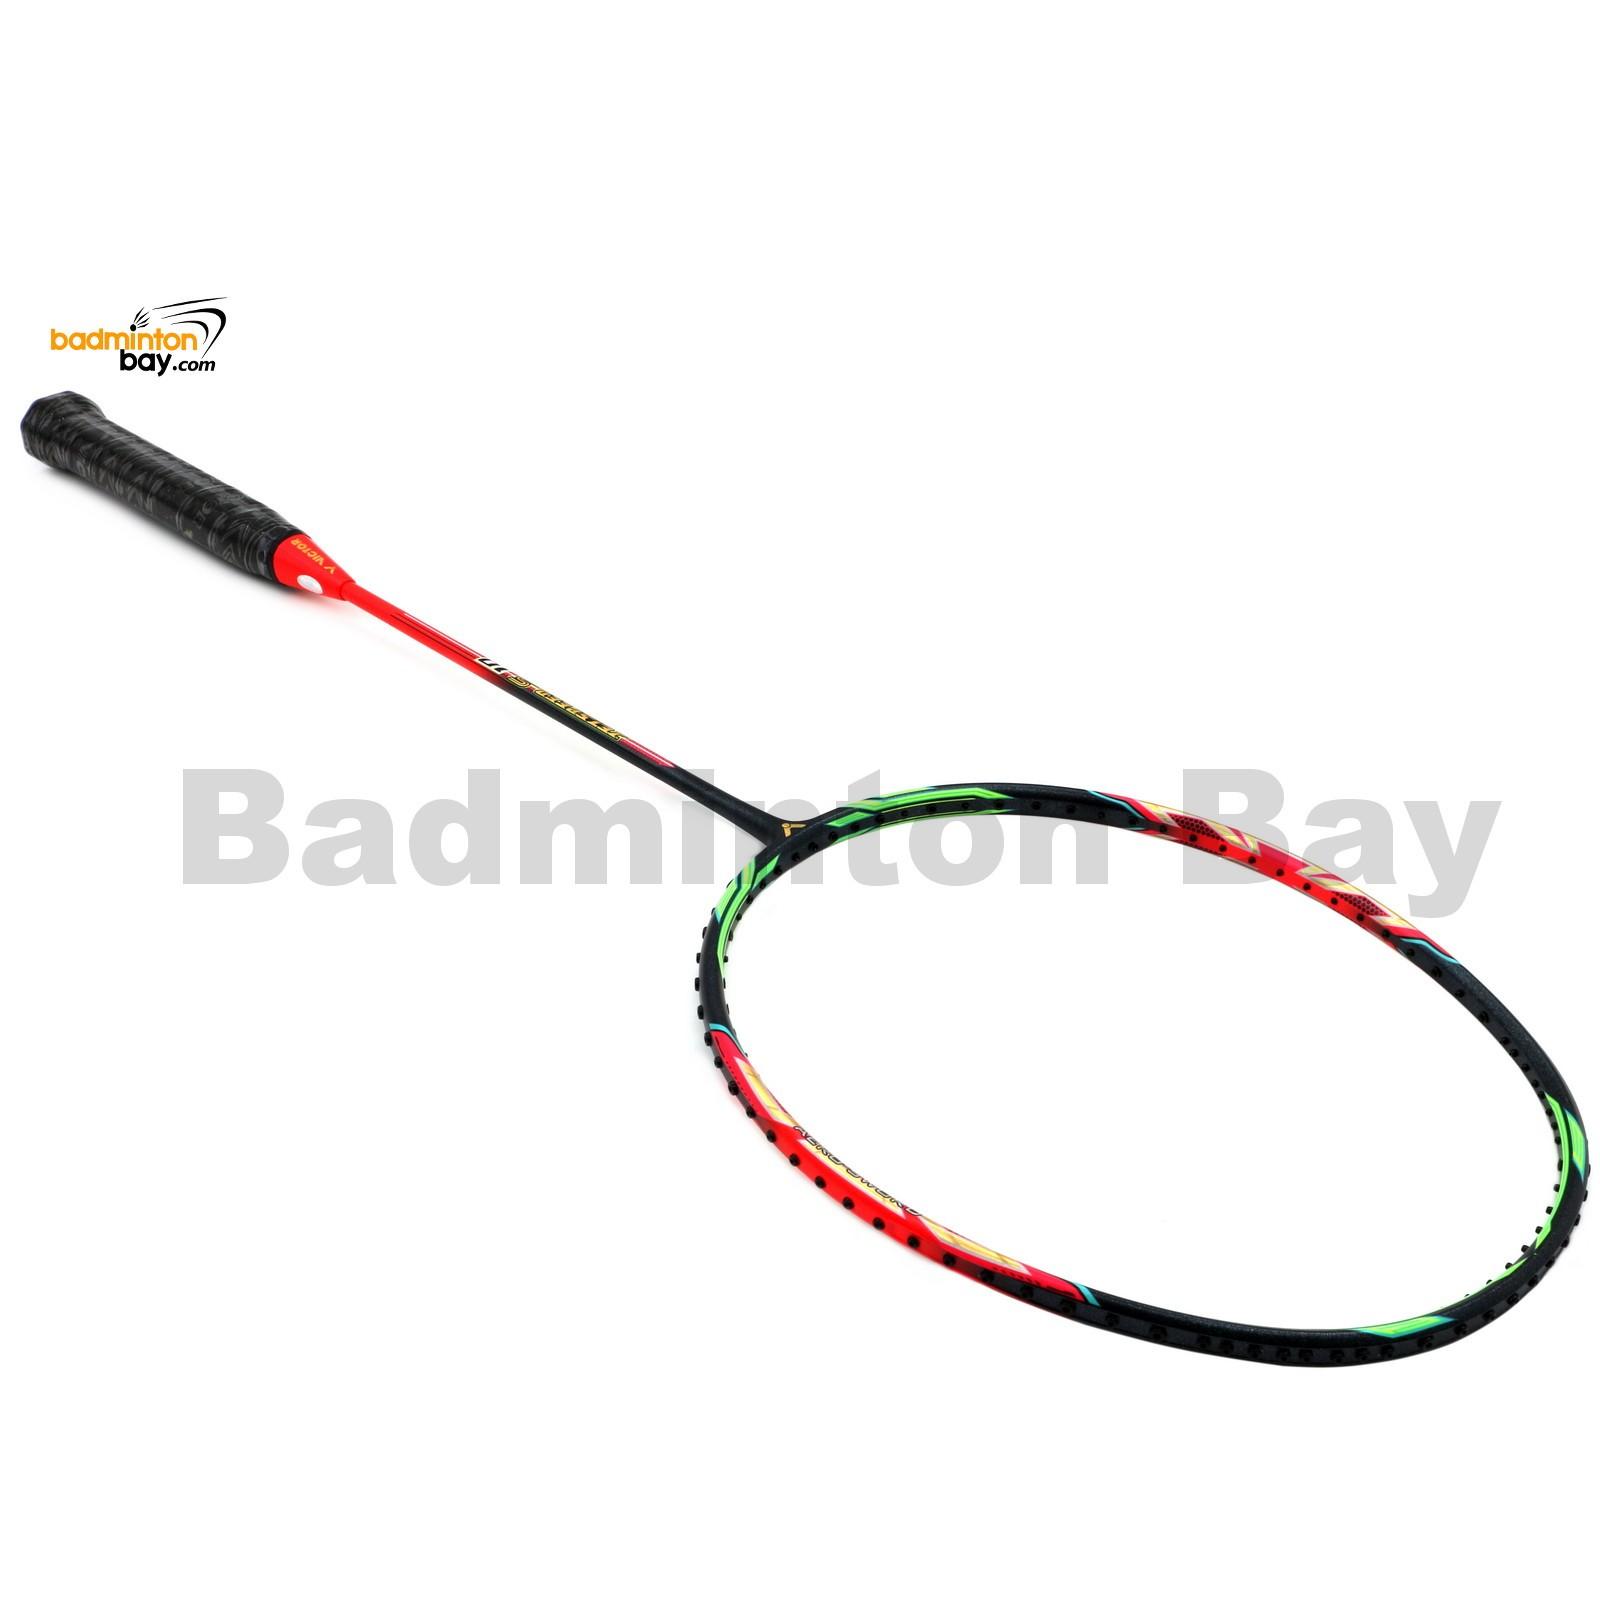 Victor Jetspeed S10 Q Neon Virtual Pink Badminton Racket